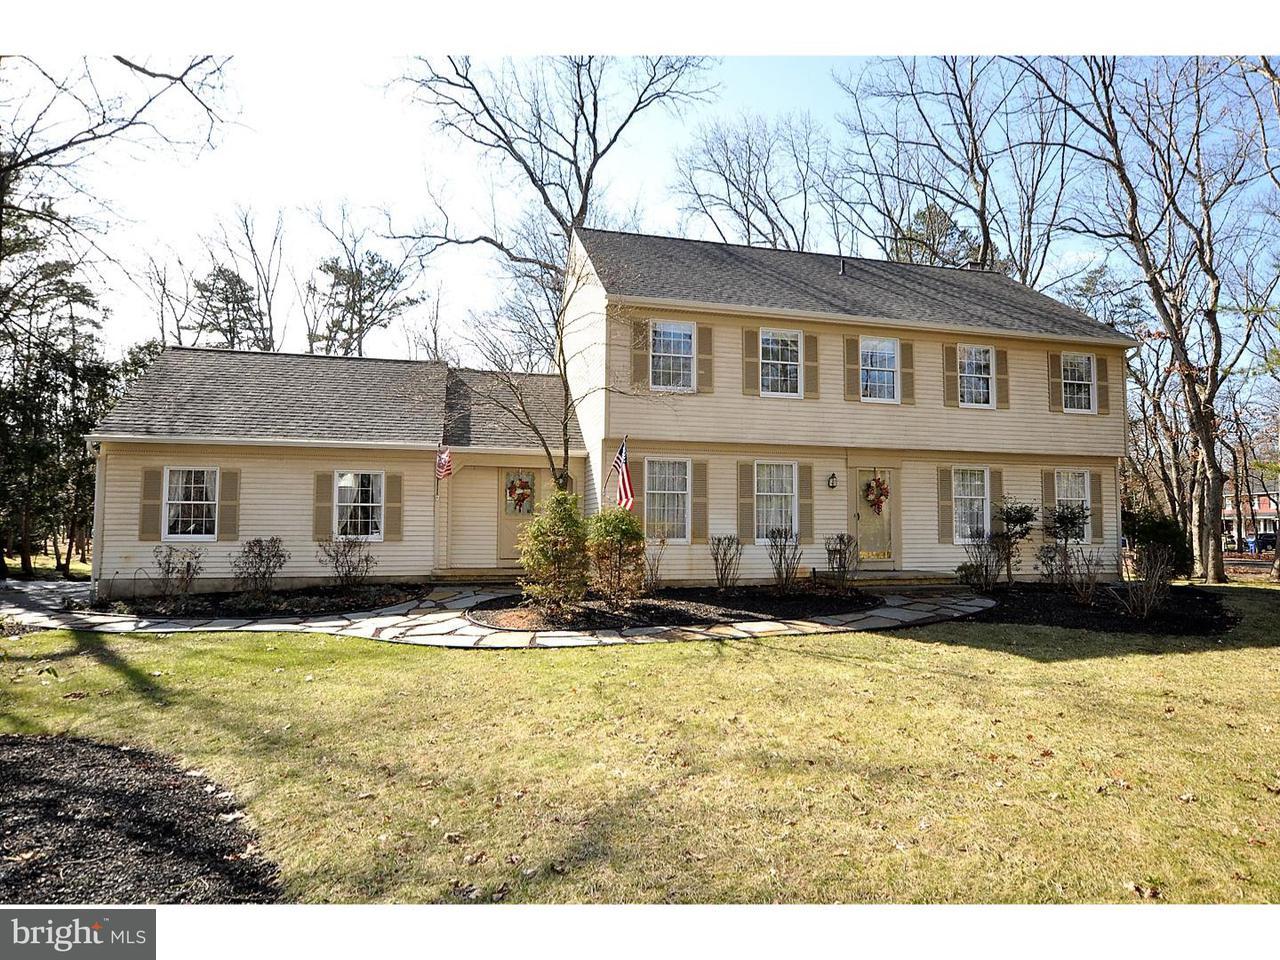 9  Oak Leaf Medford Twp, NJ 08055